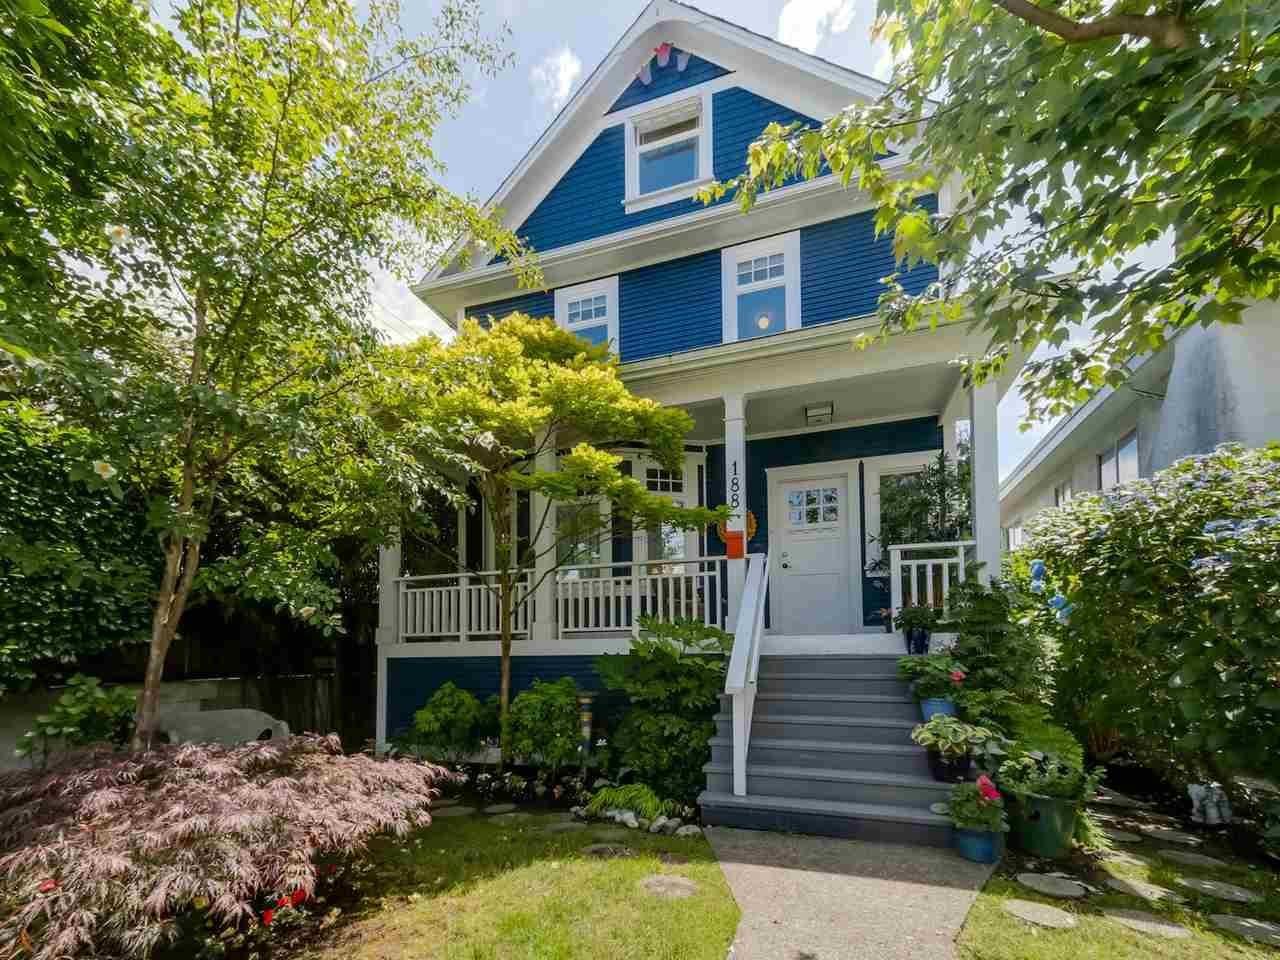 R2082372 - 188 E 26TH AVENUE, Main, Vancouver, BC - House/Single Family